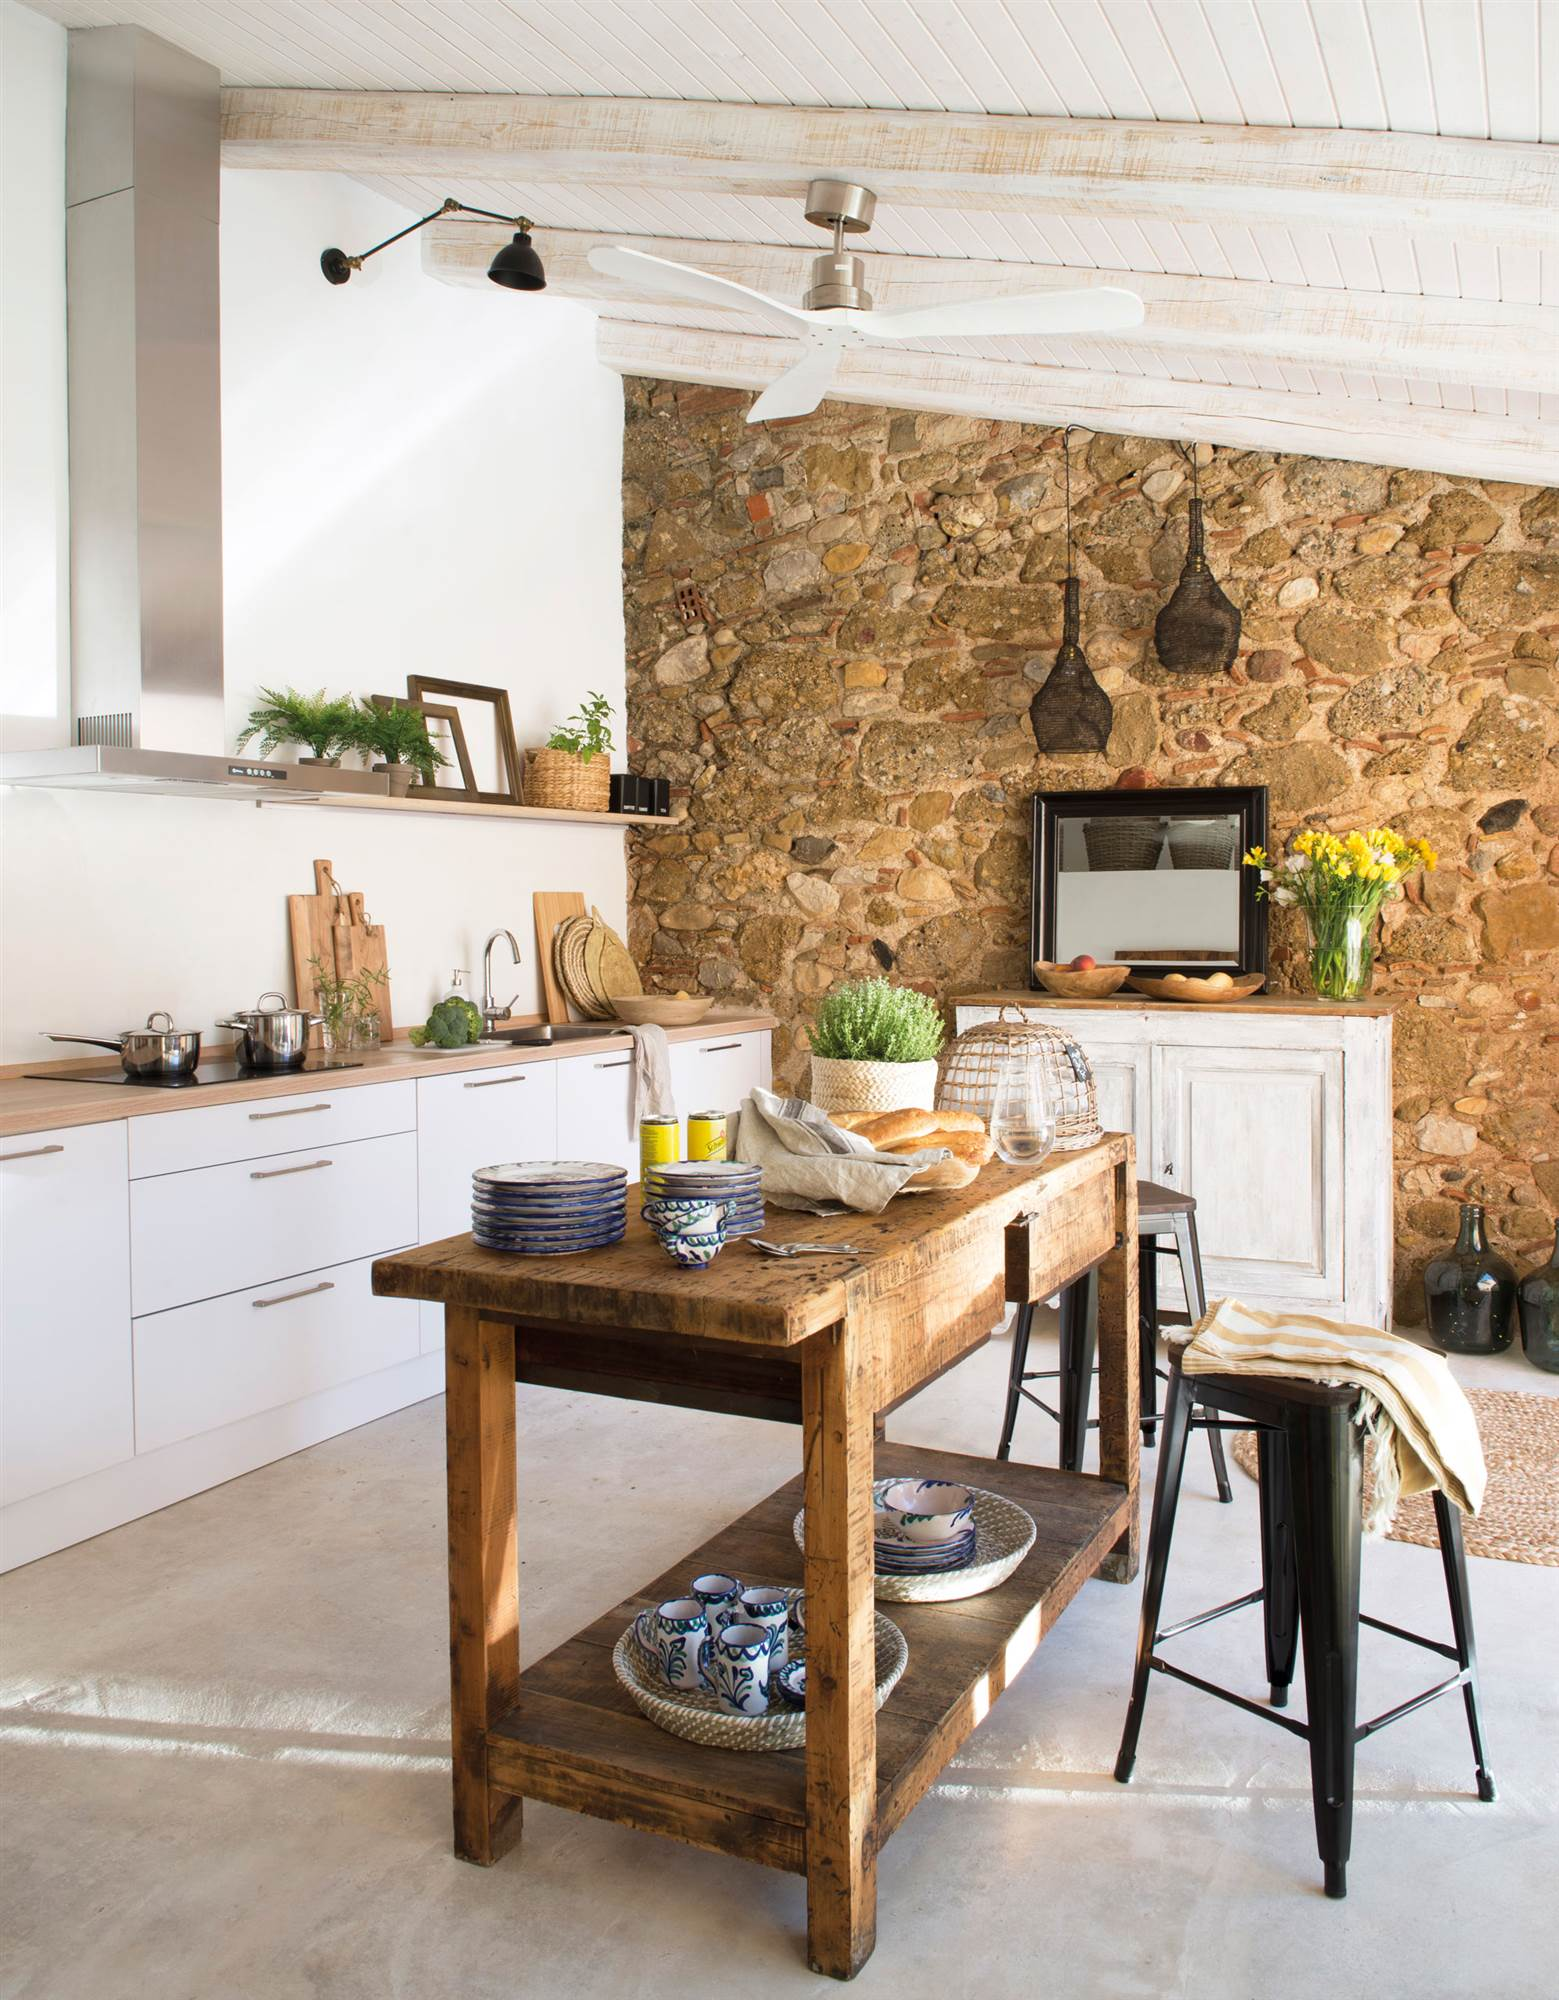 Decorar con madera en bruto - Mesa pared cocina ...